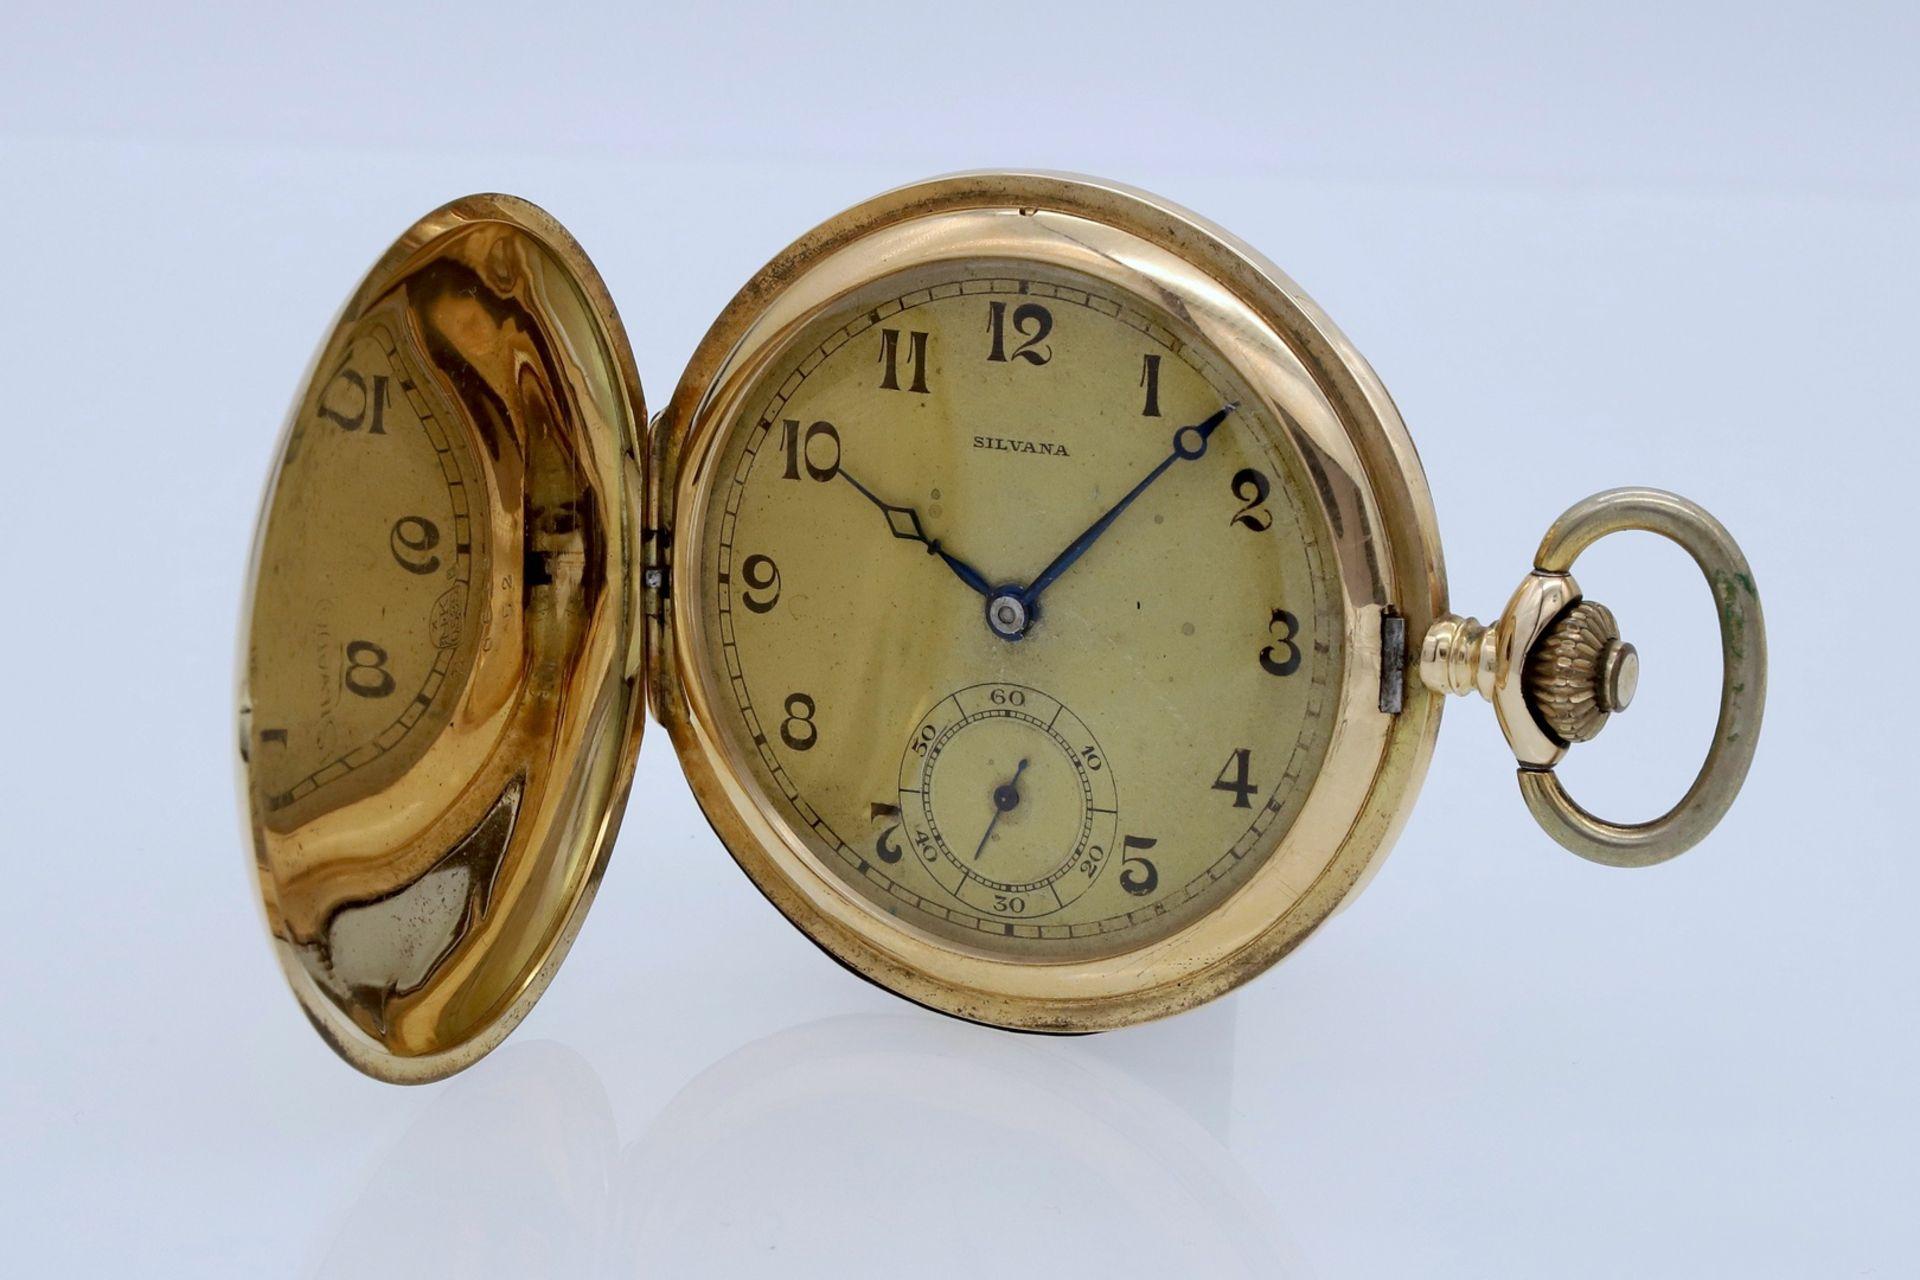 Silvana goldene Savonnette / Taschenuhr, um 1920